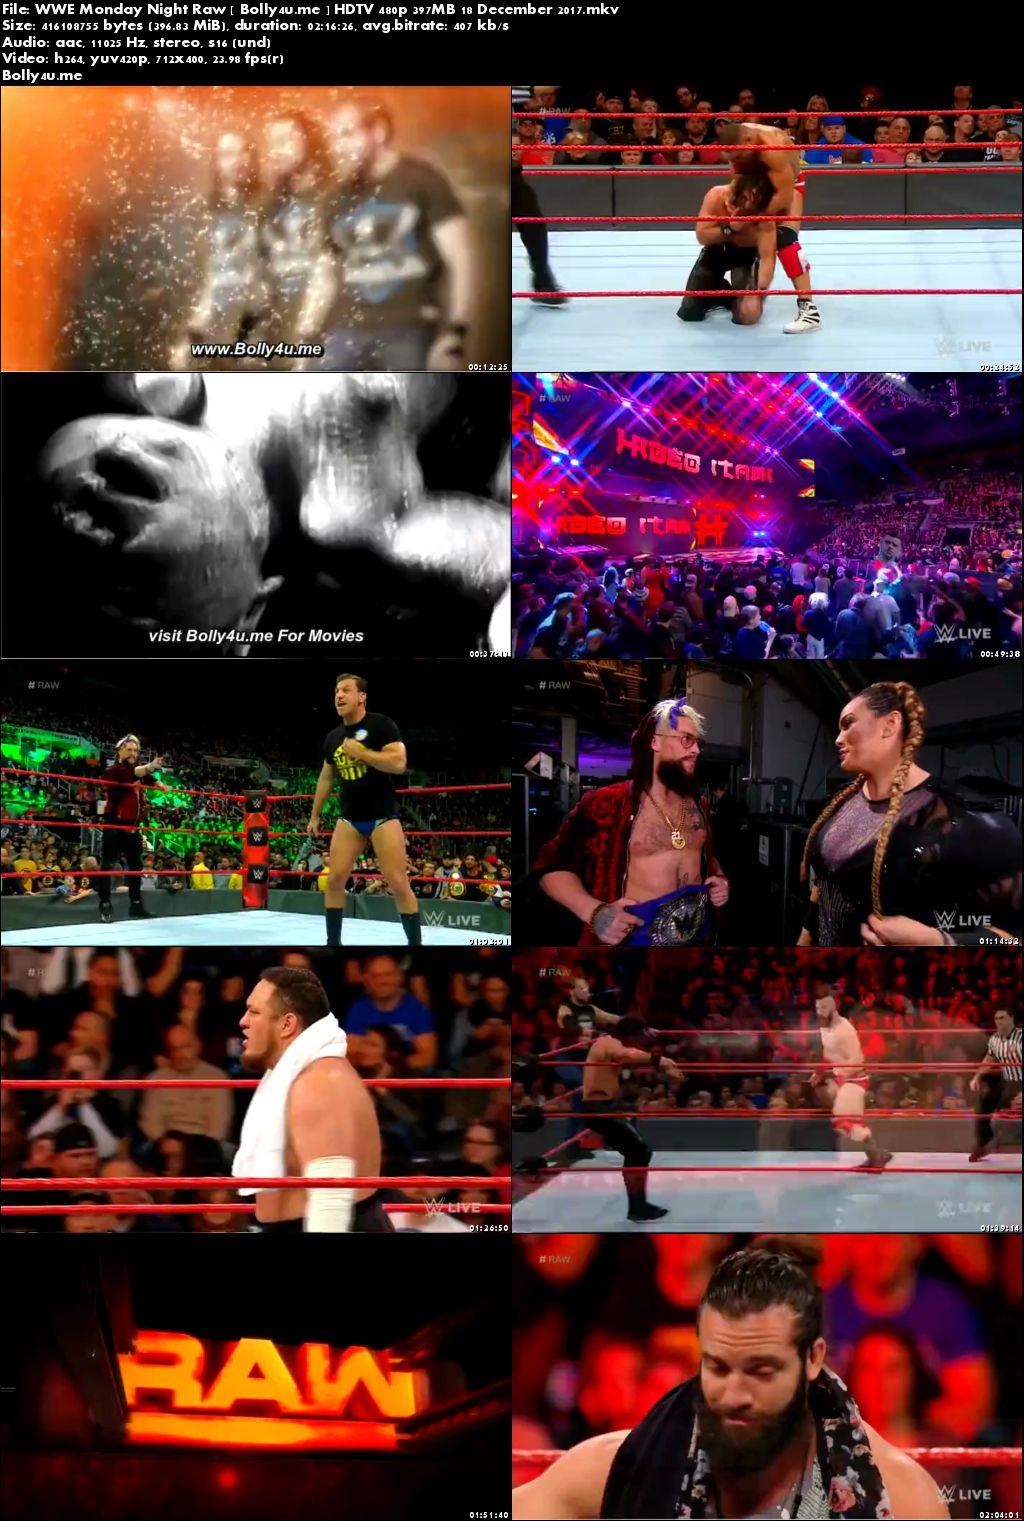 WWE Monday Night Raw HDTV 480p 400MB 18 December 2017